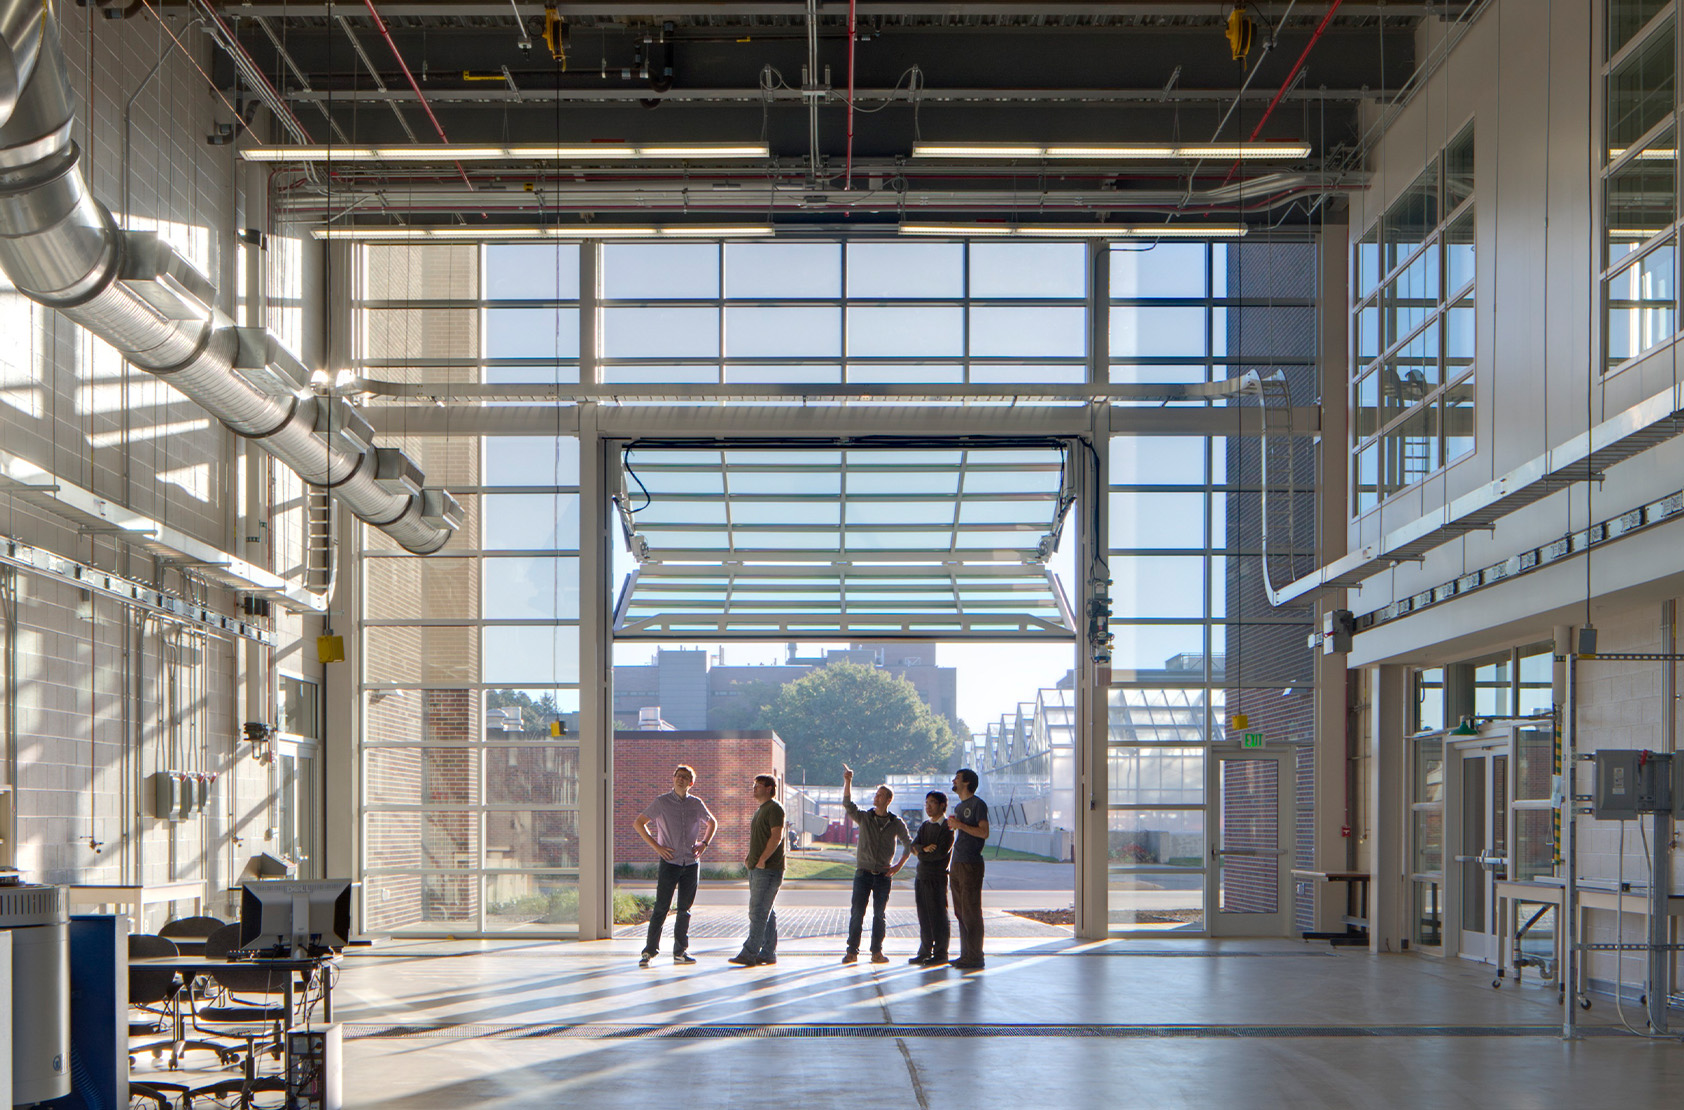 Purdue University - Center for High Performance Buildings